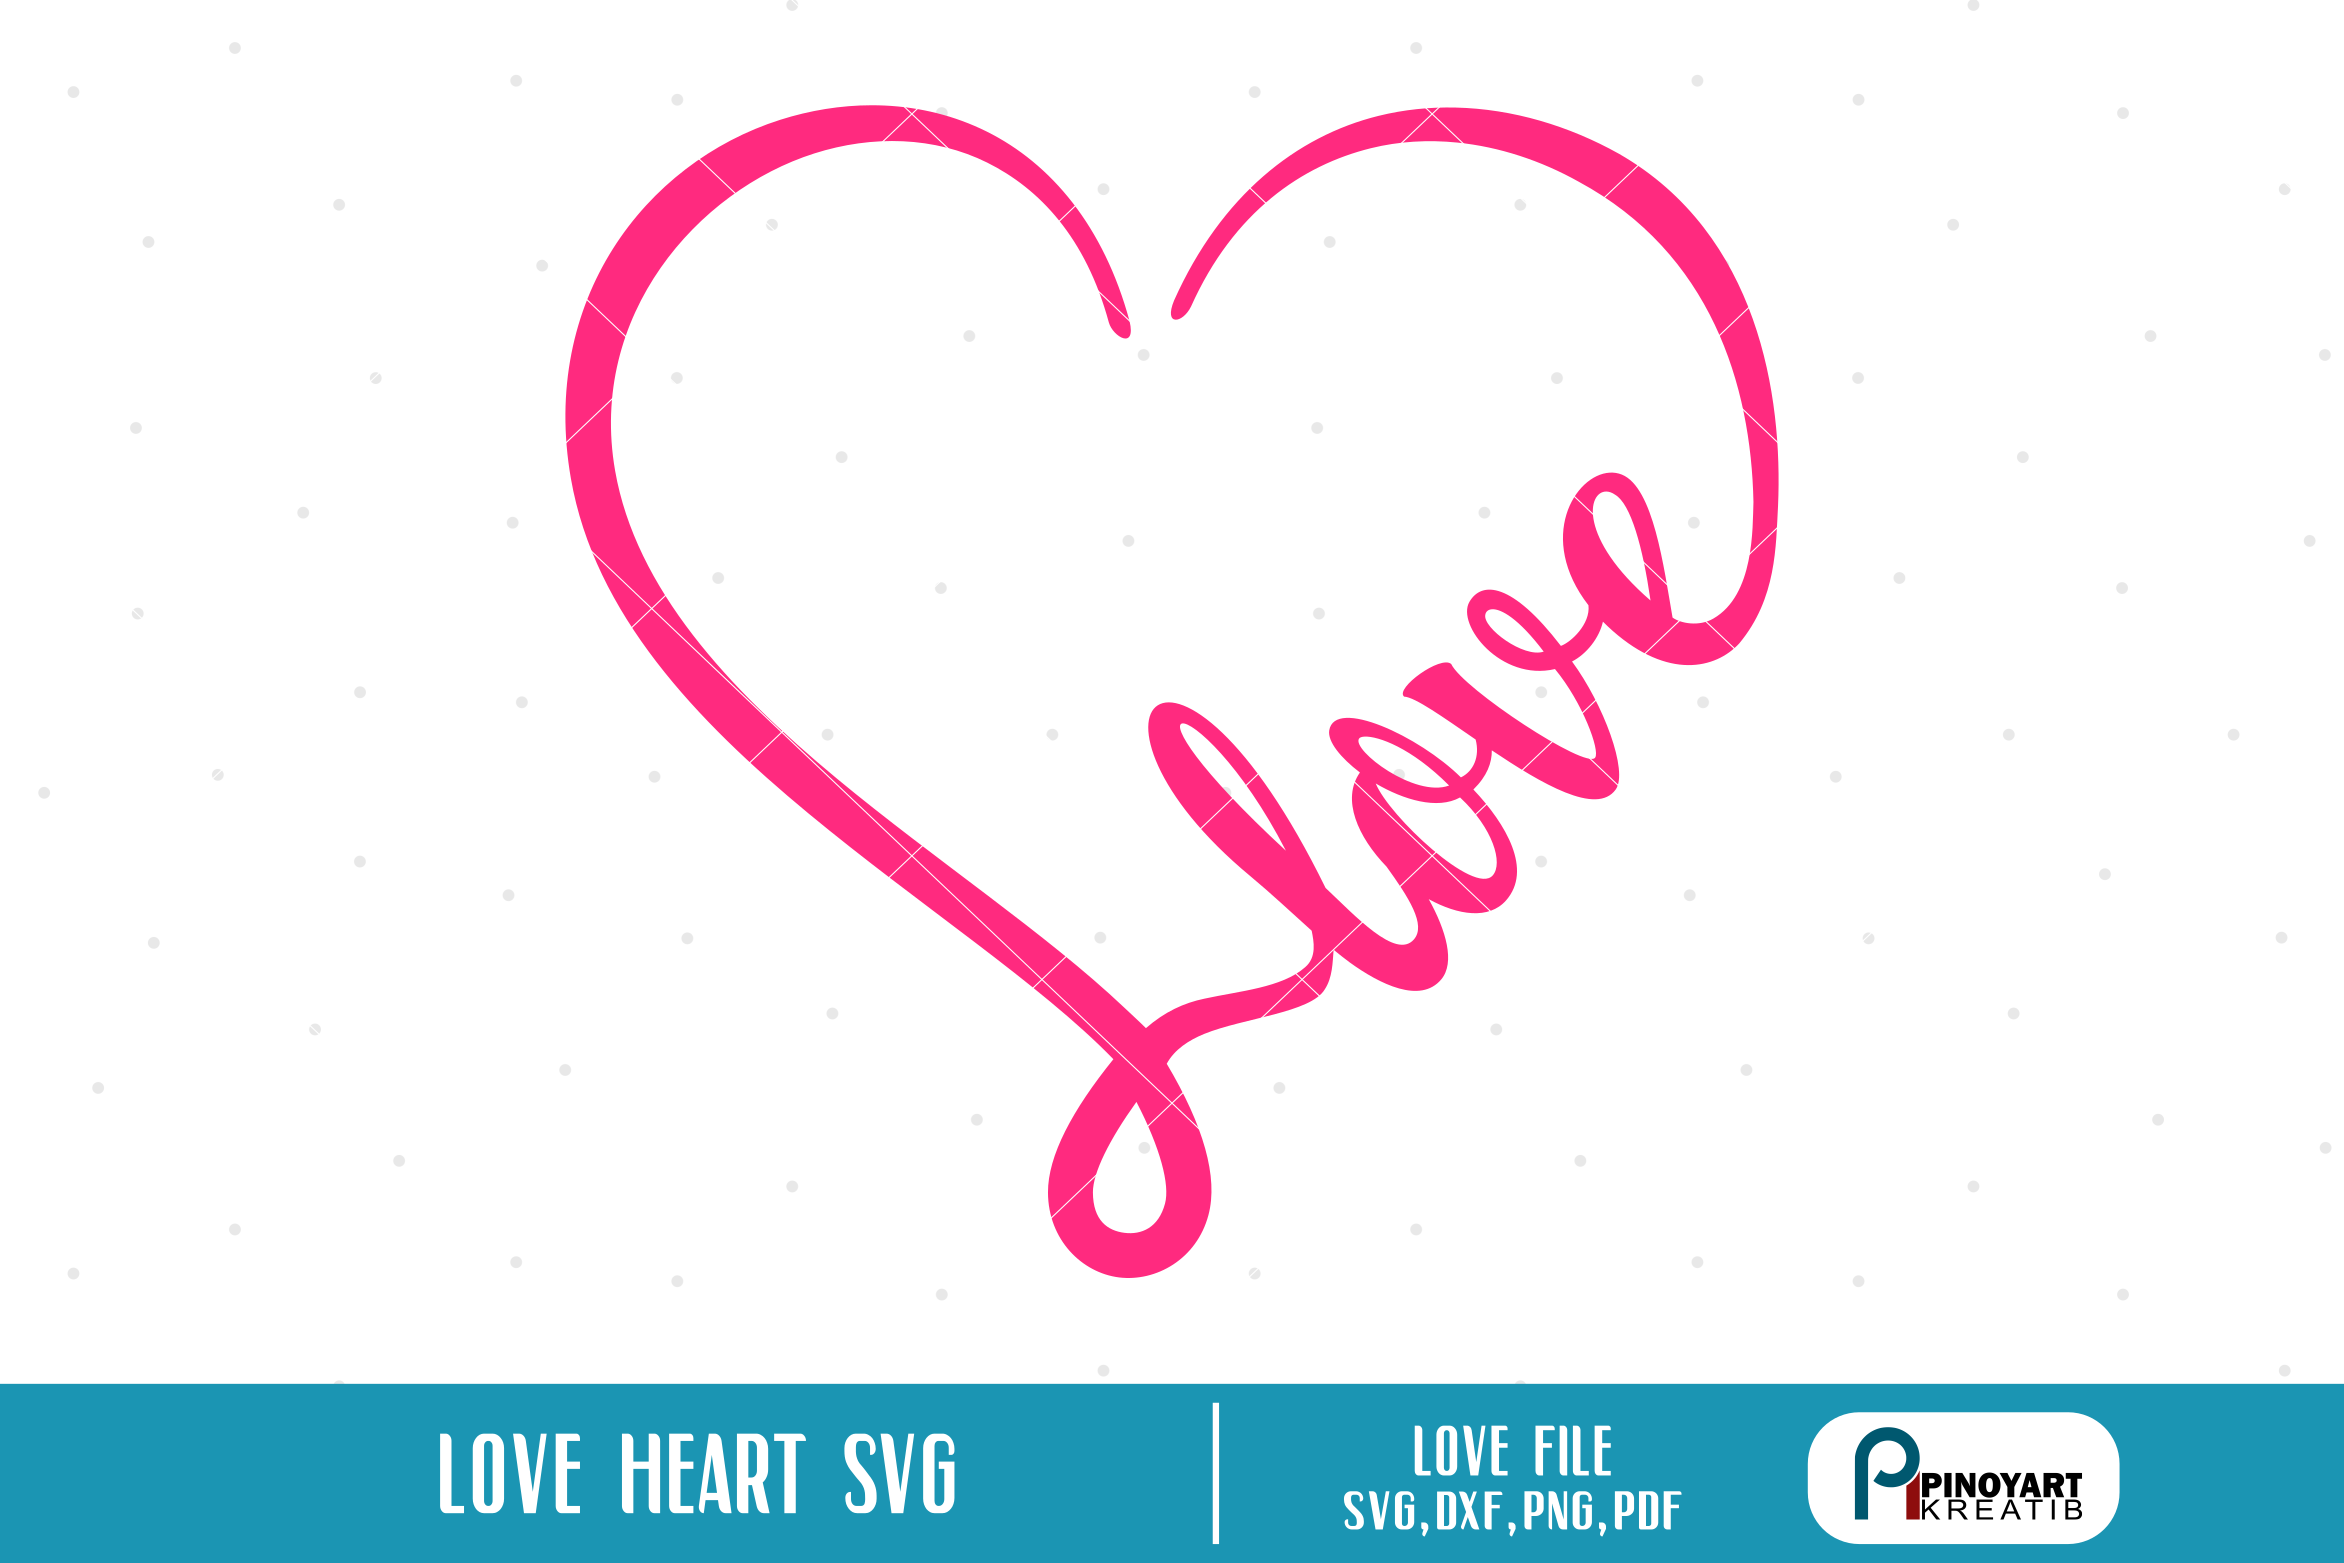 Download Love Heart svg - a love vector file